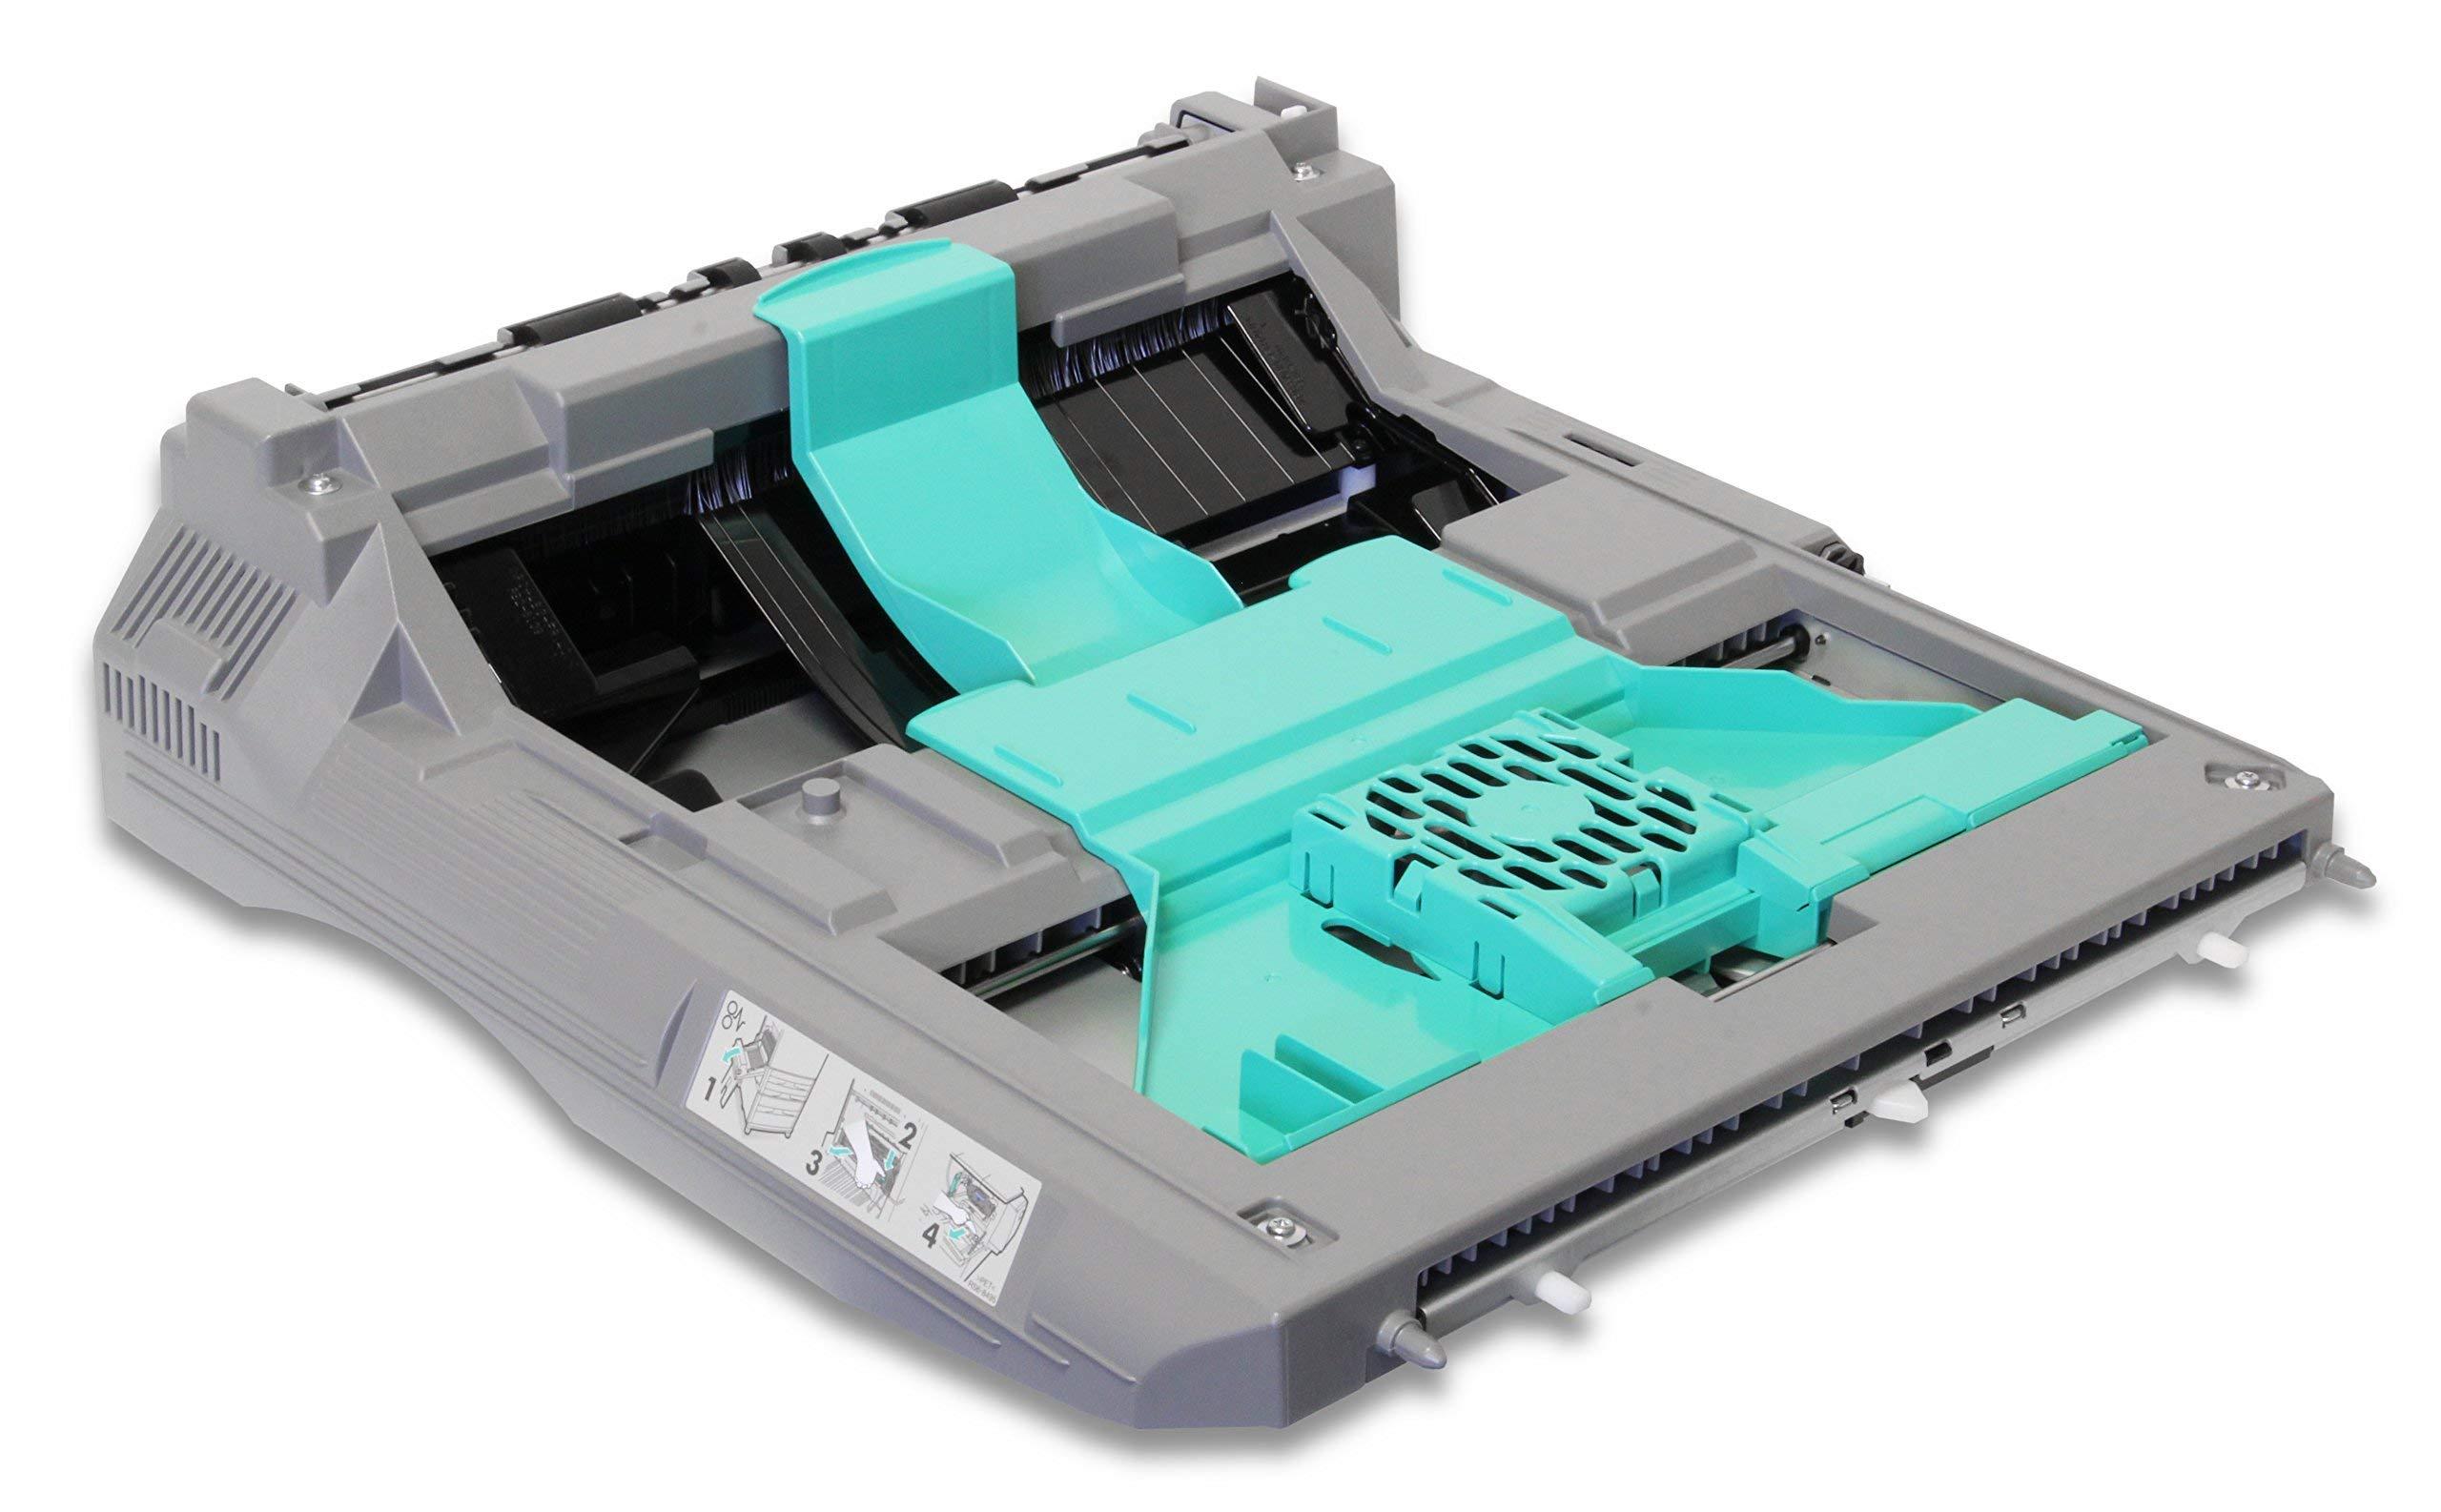 HP LaserJet 9000 9050 Duplexer/Duplex Accessory - C8532A (Renewed) by HP (Image #3)